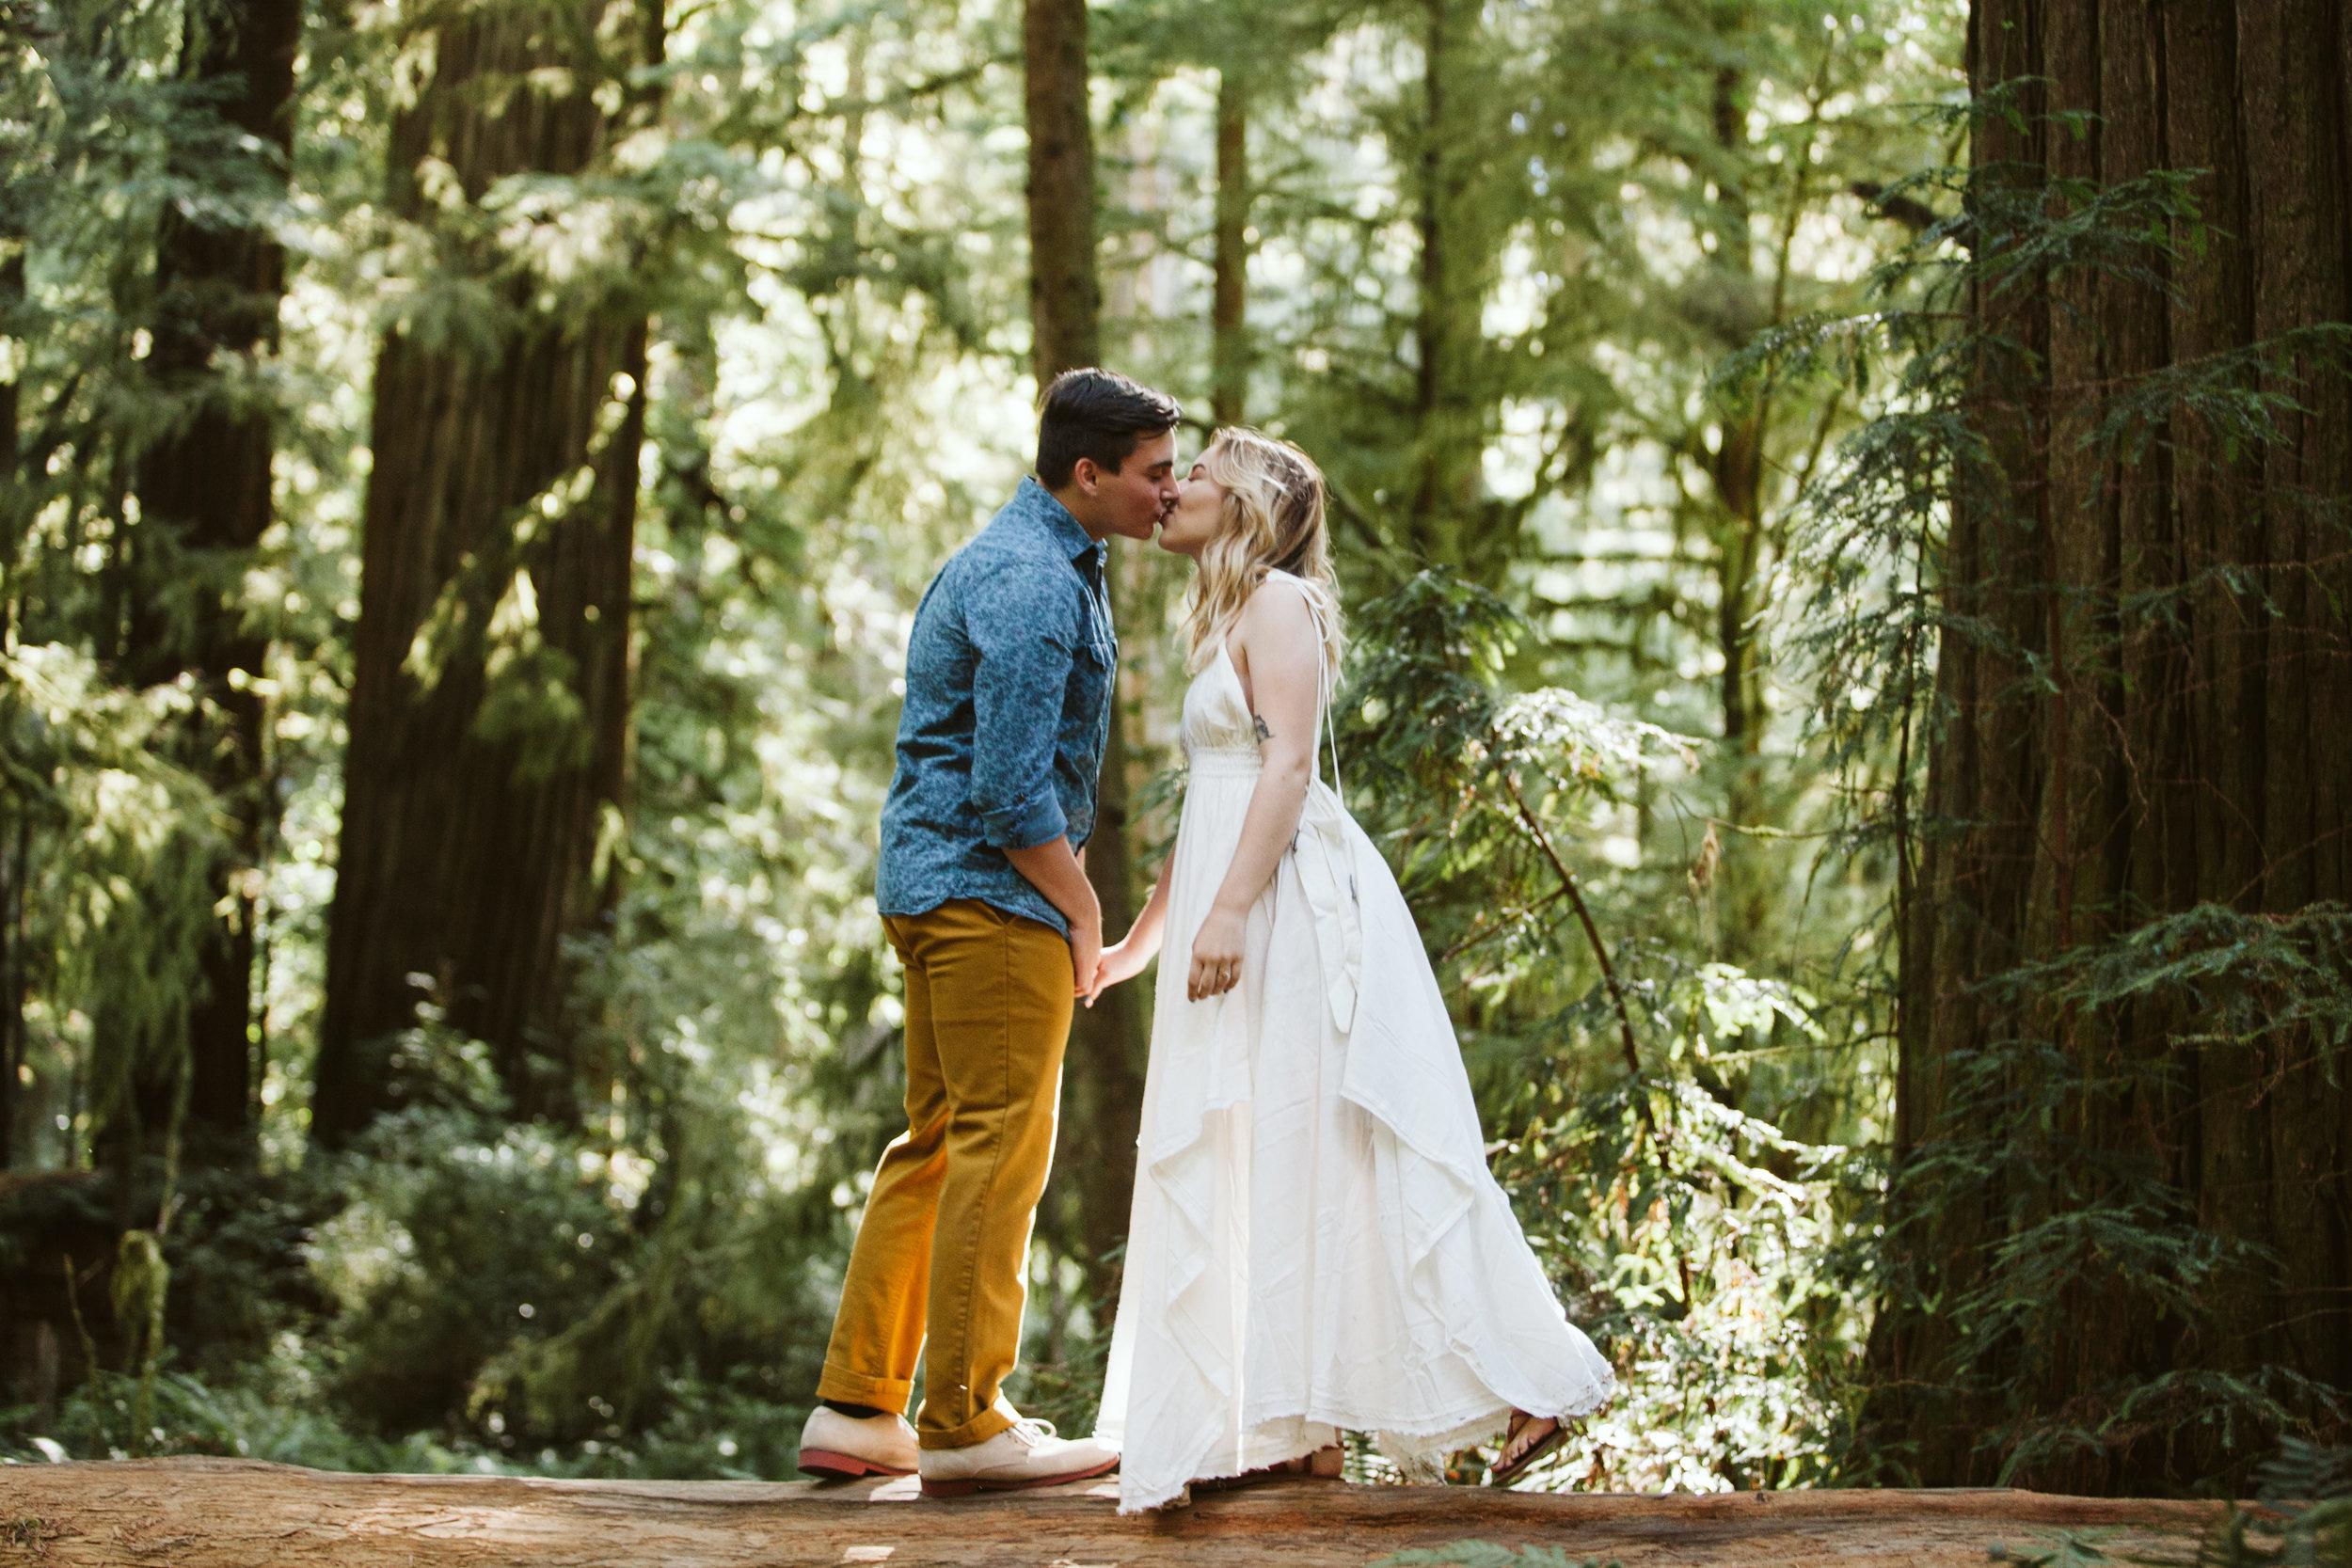 Hannah&Ben_Redwoods_Elopement_Engagement_PNW_SouthernOregon_NorthernCalifornia_ (5 of 23).jpg